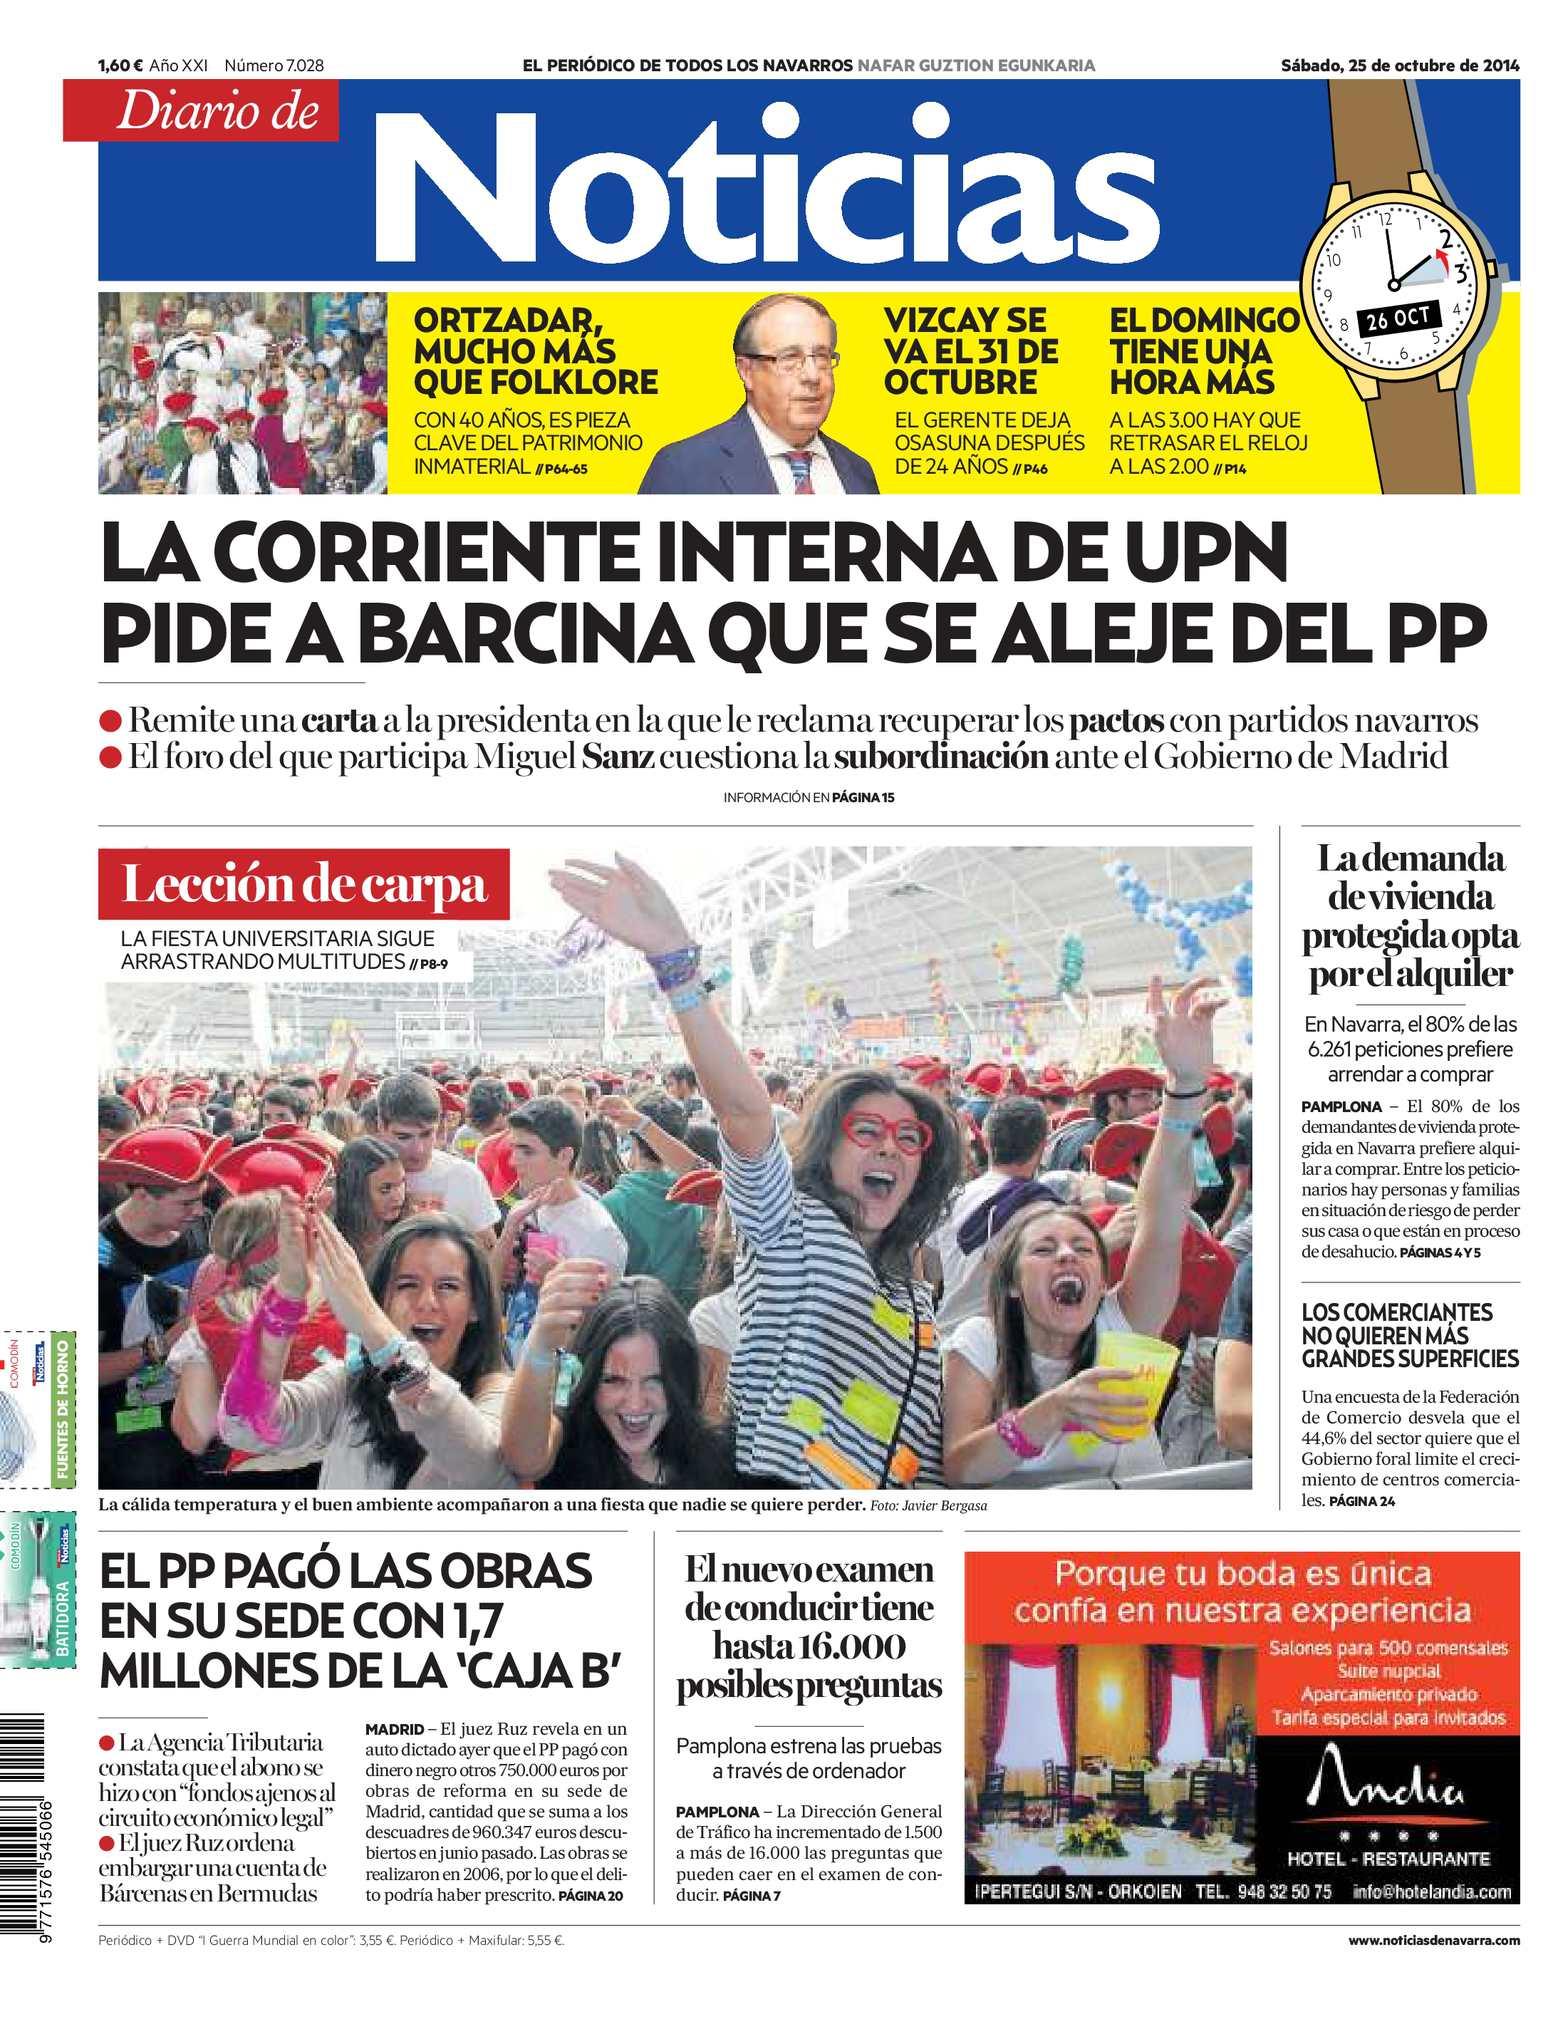 Calaméo - Diario de Noticias 20141025 9c95516bad9